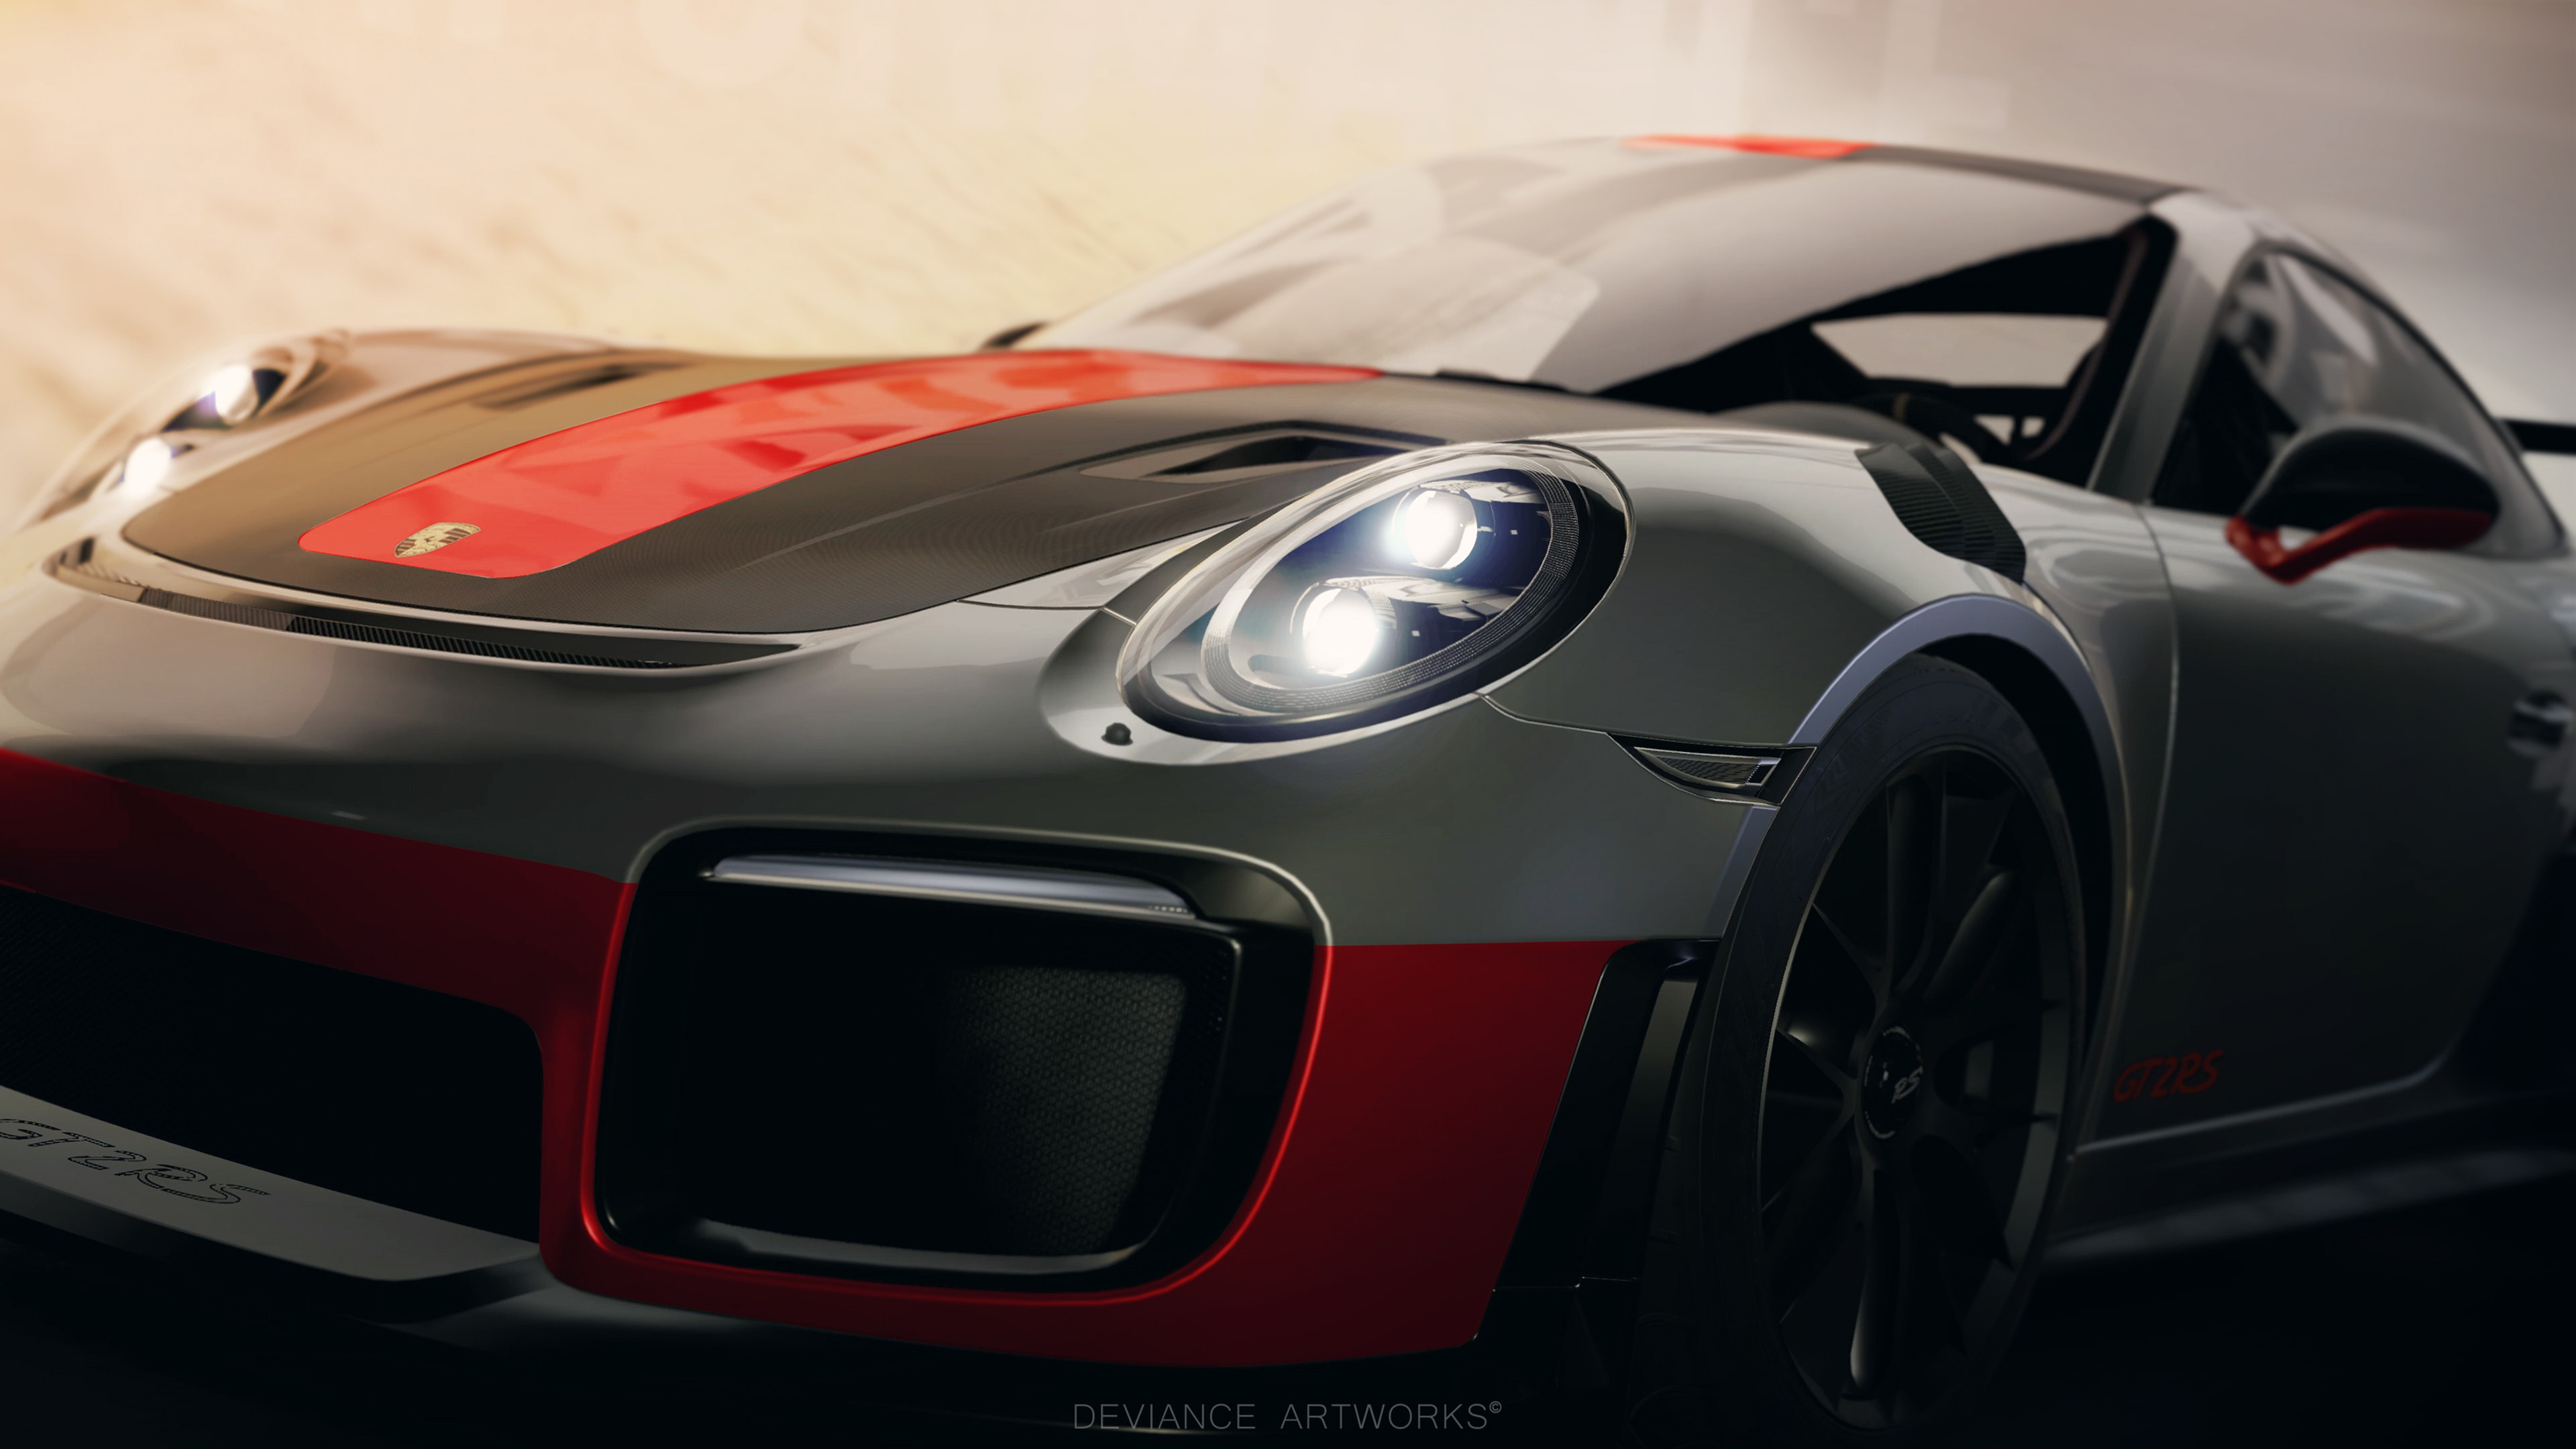 porsche 911 gt2 rs forza motorsport 7 wallpaper hd car wallpapers. Black Bedroom Furniture Sets. Home Design Ideas